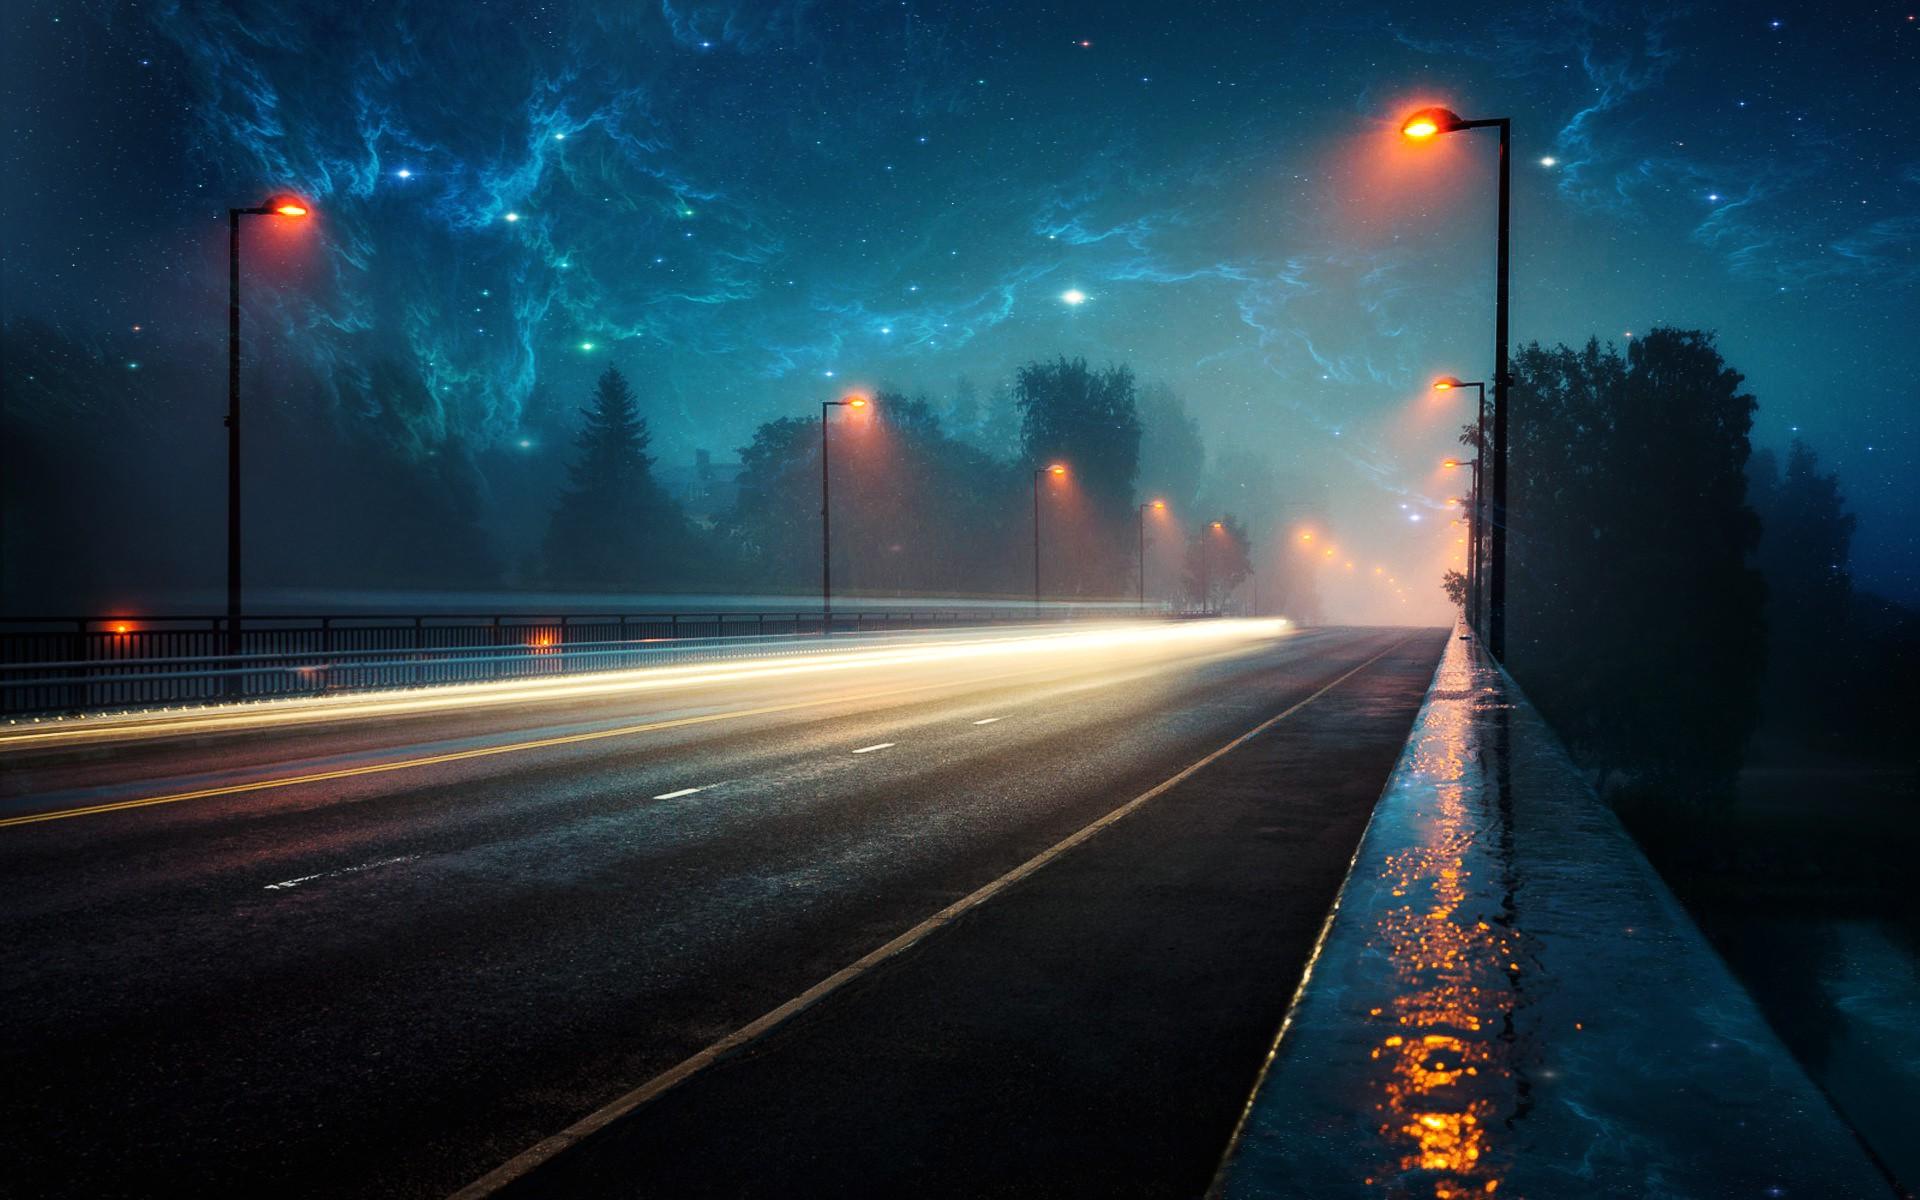 Wallpaper 1920x1200 px evening lighter lights nebula - Space wallpaper road ...